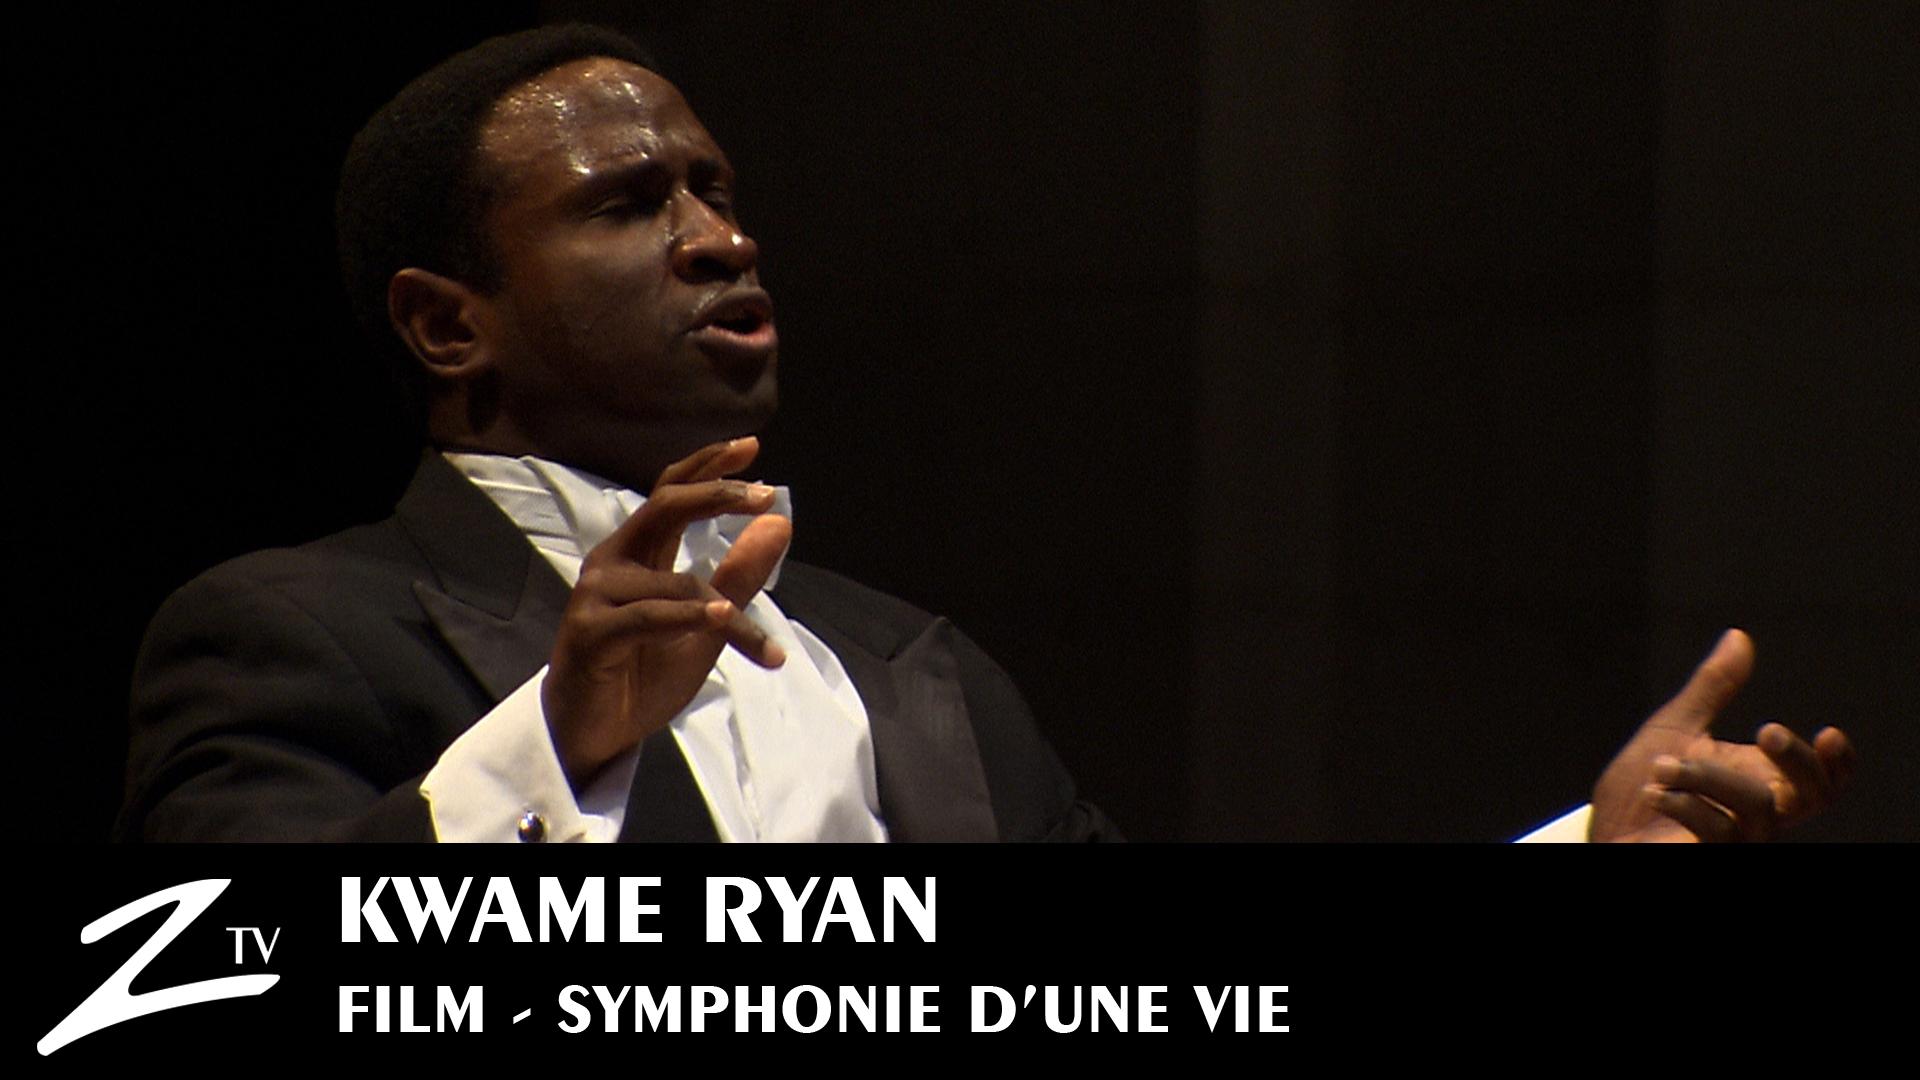 Kwame Ryan